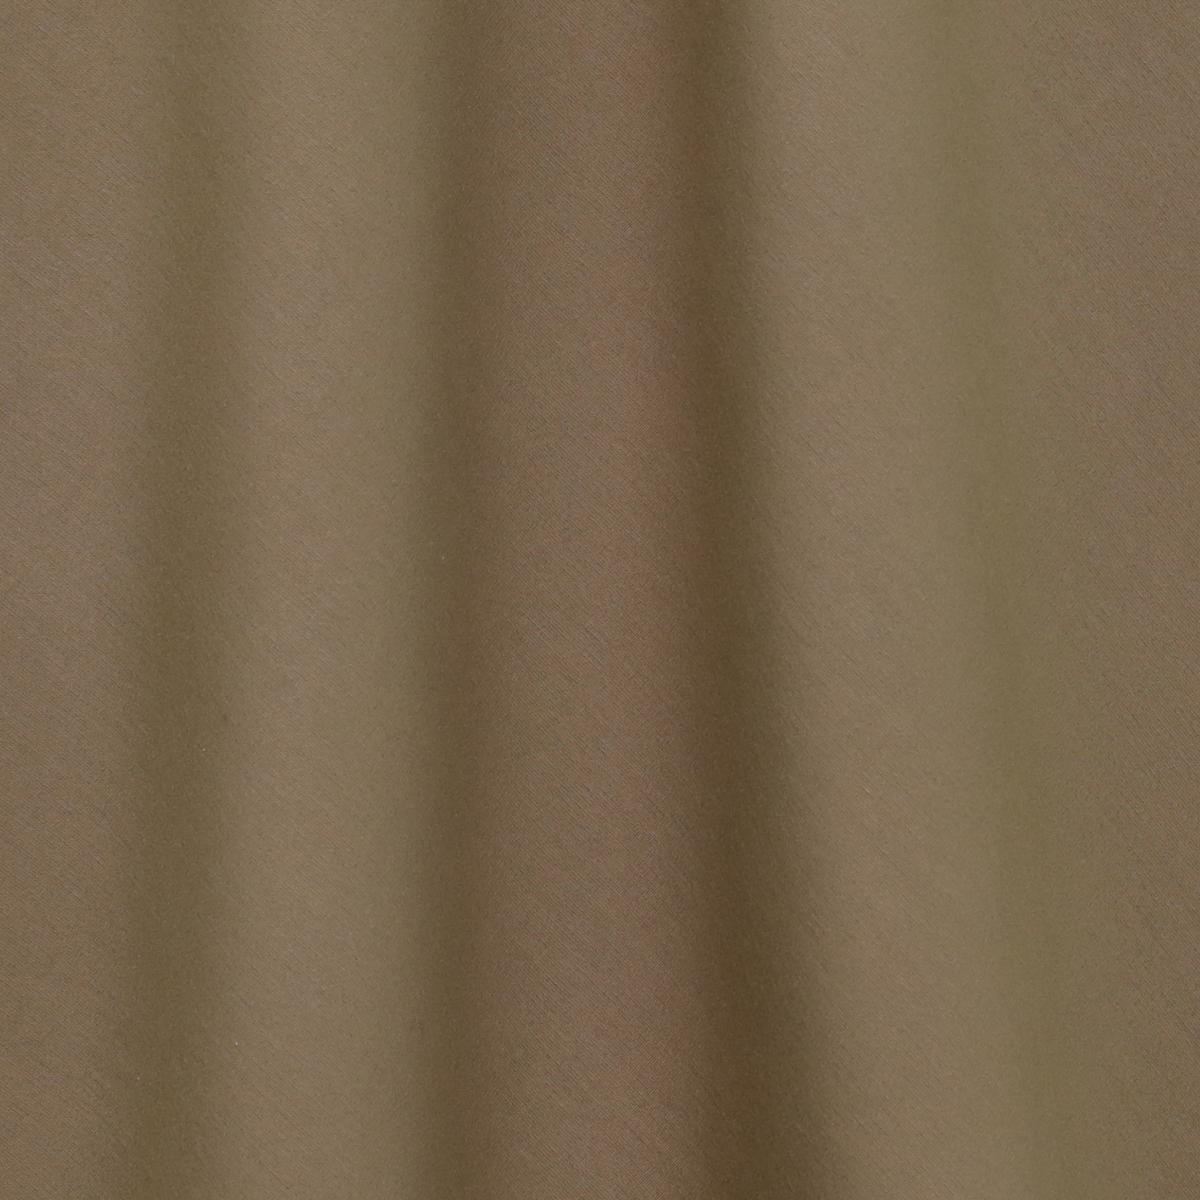 Вискозное стретч-джерси с нейлоном